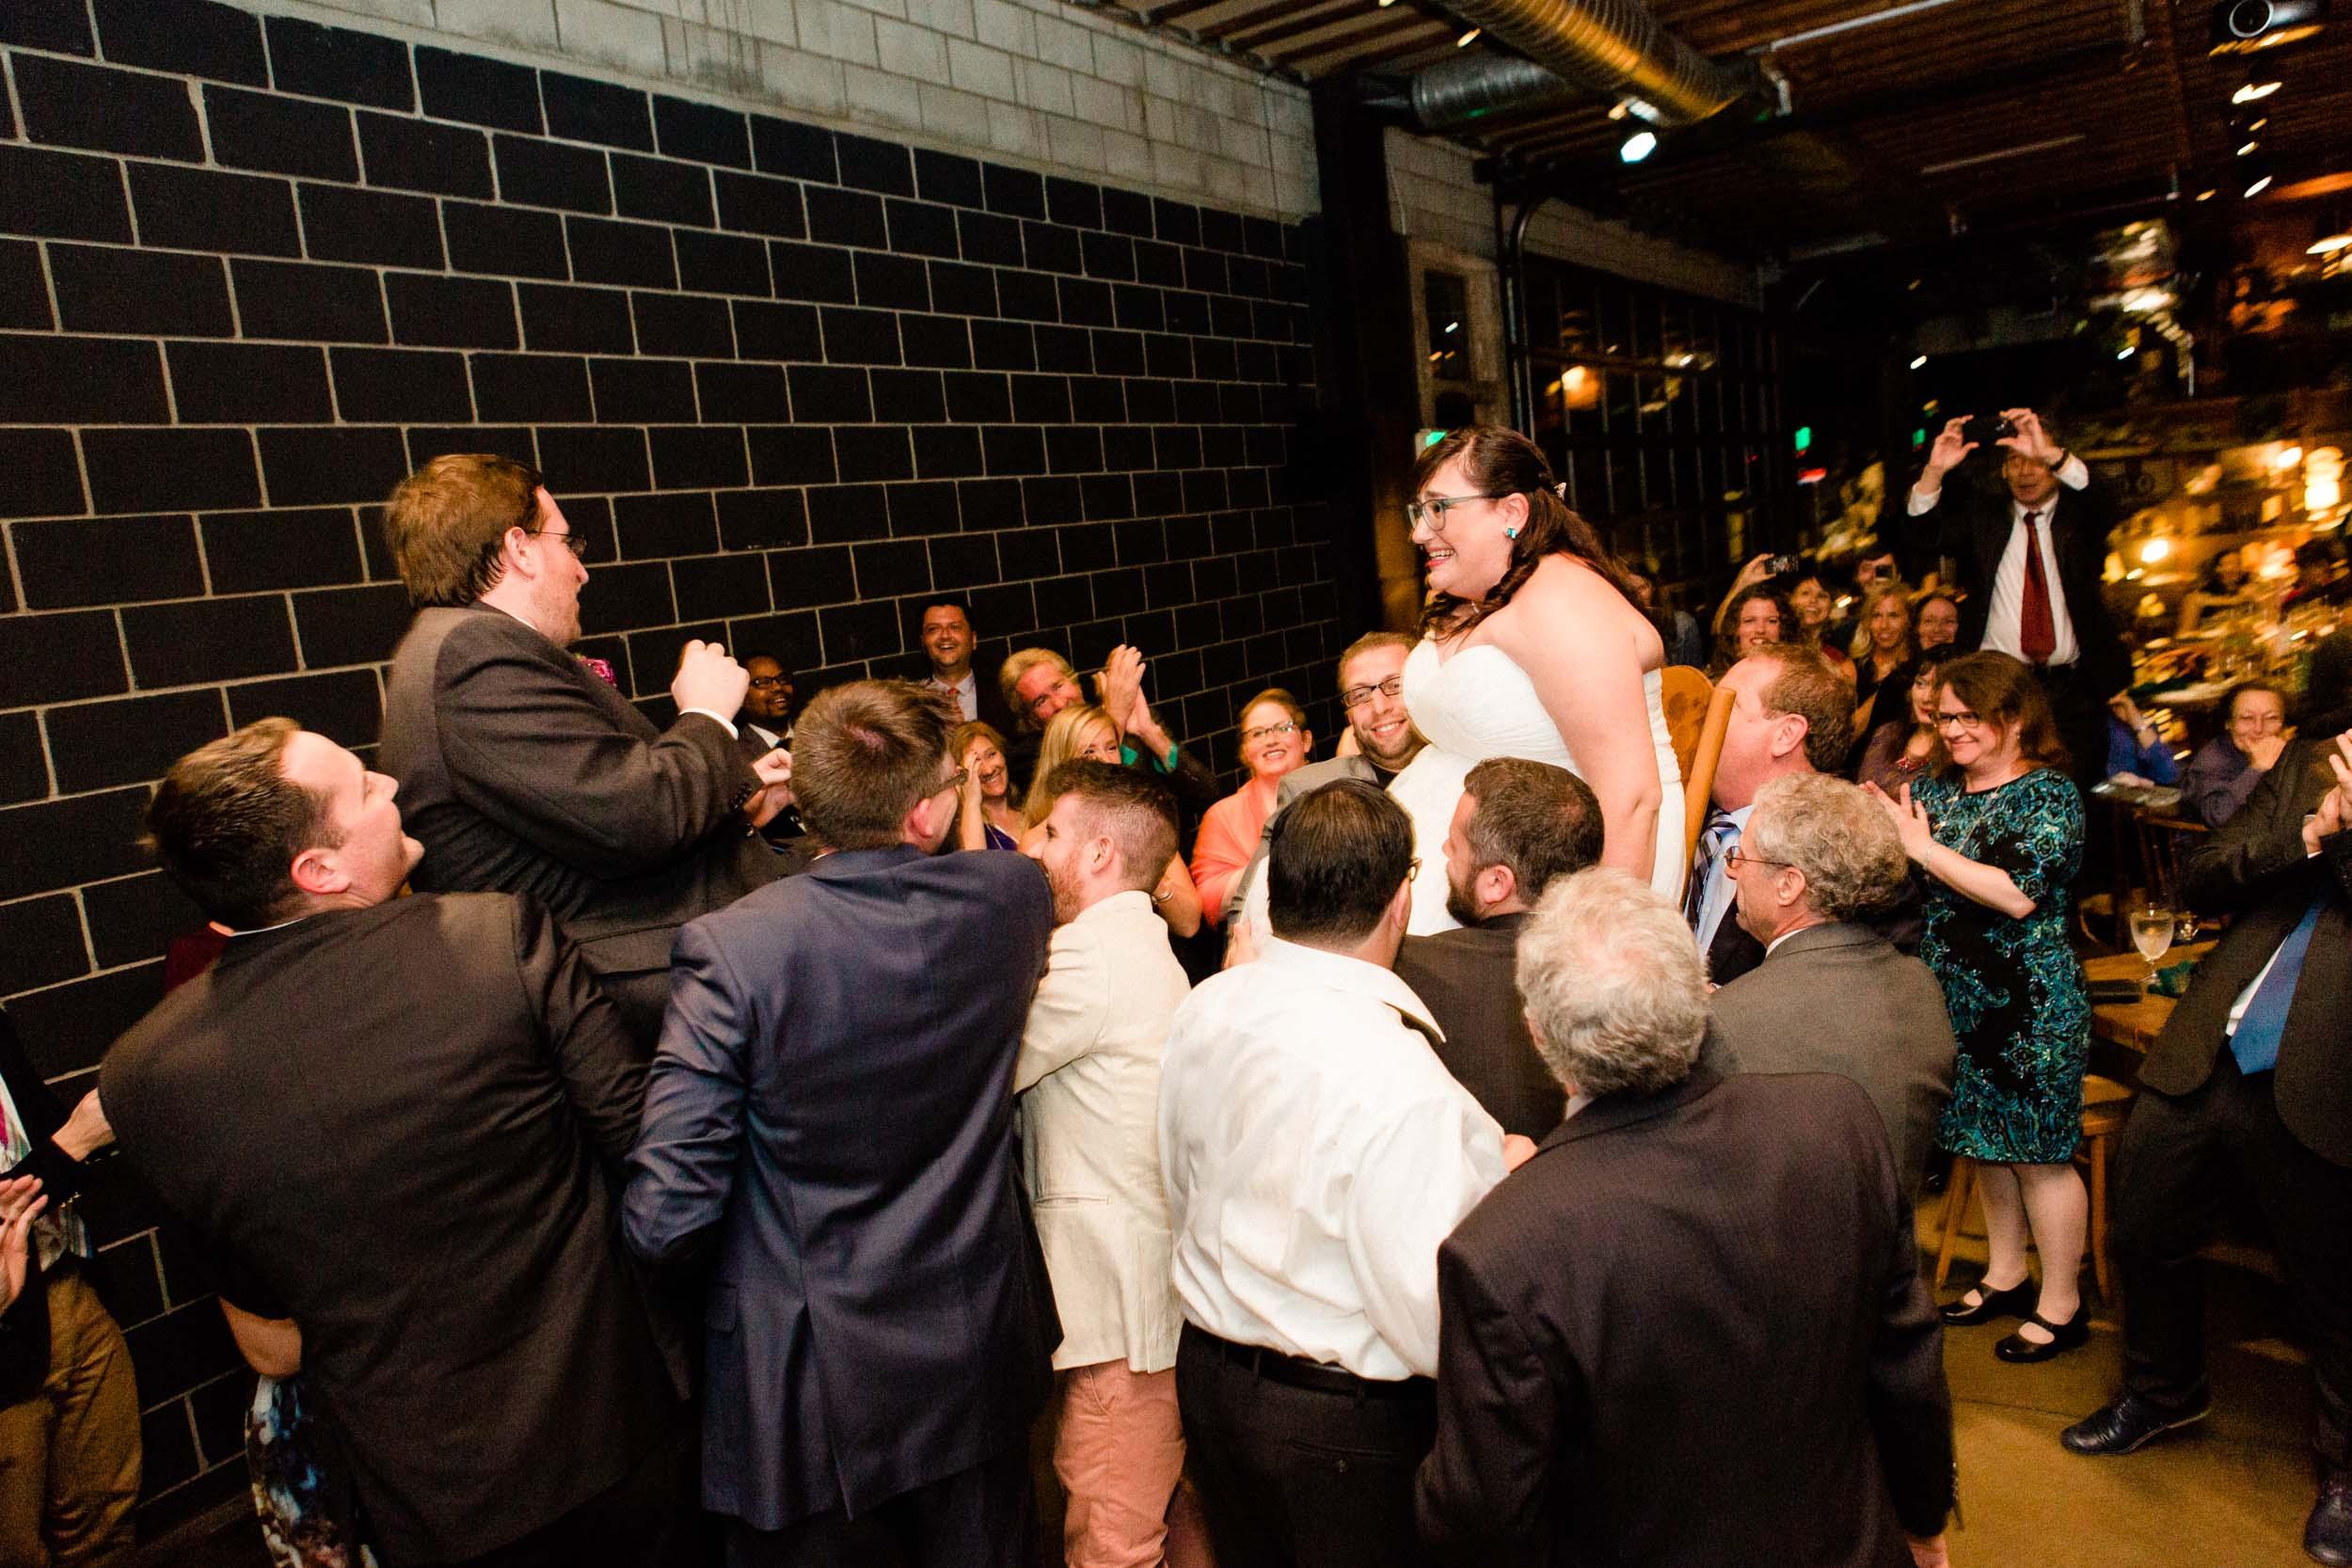 BKM-Photography-Smog-Shoppe-Culver-City-Wedding-Photographer-Culver-Hotel-0067.jpg